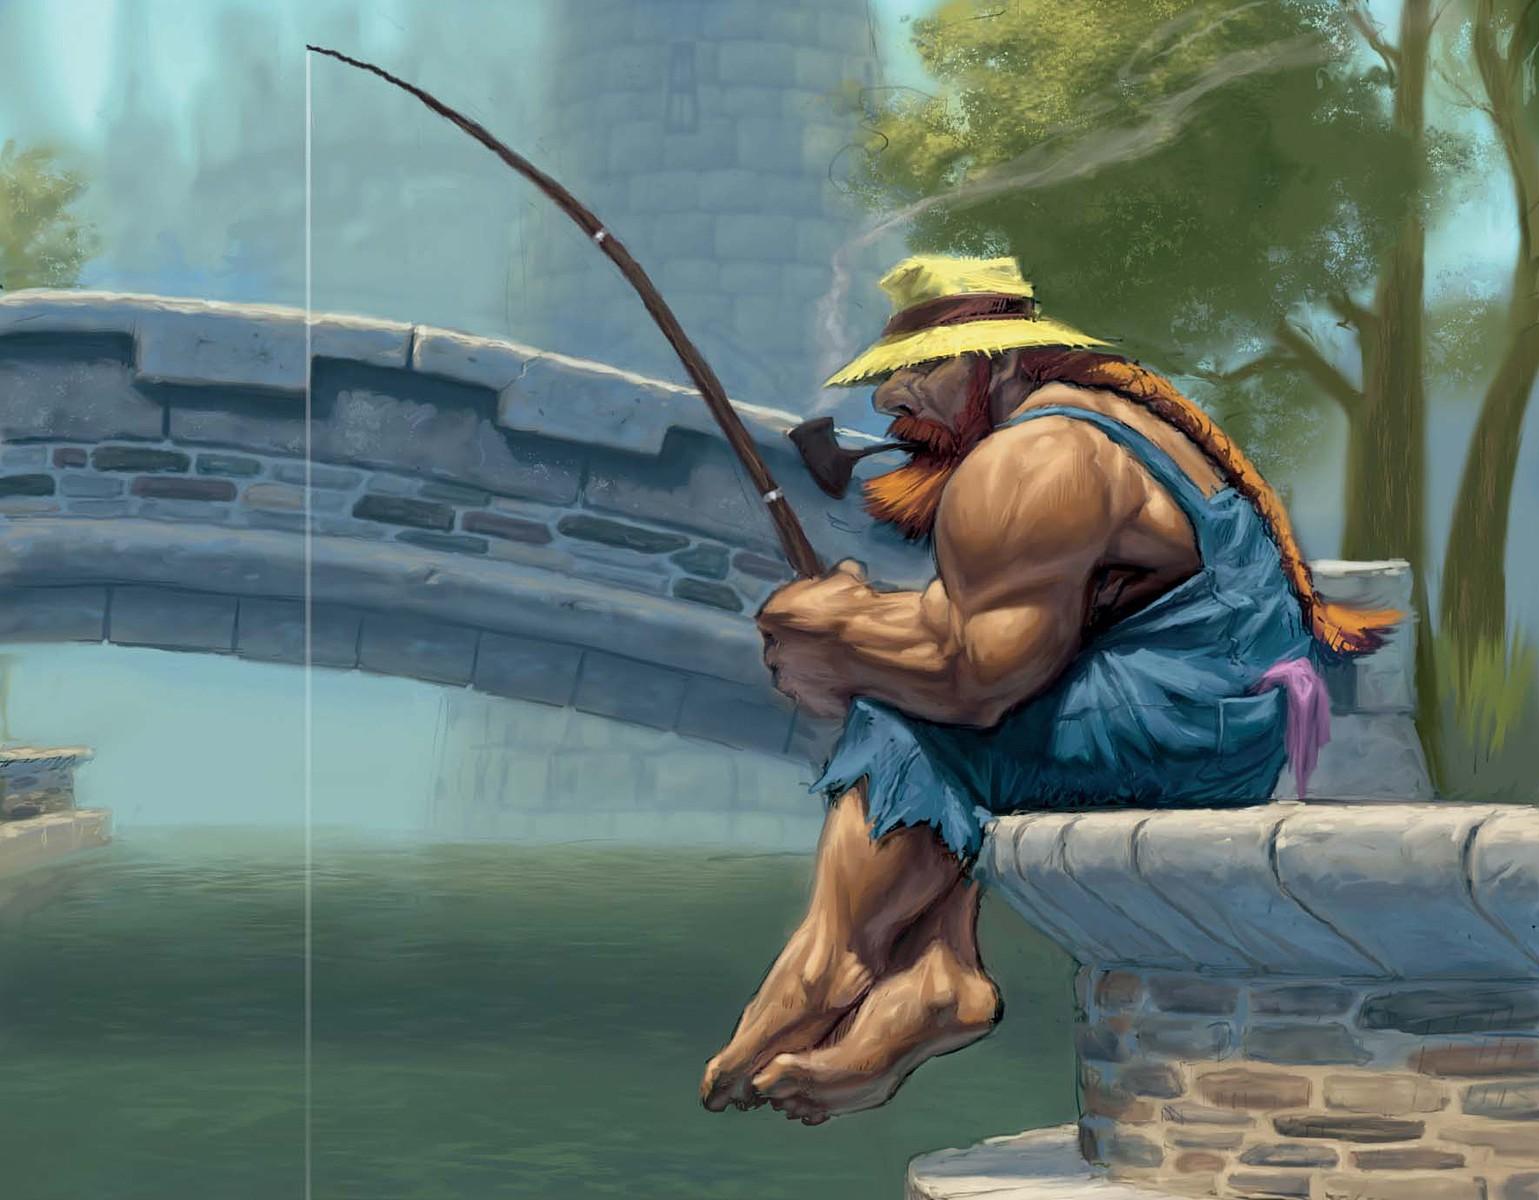 Guia de Pescaria   World of WarCraft, WarCraft, wow, azeroth, lore